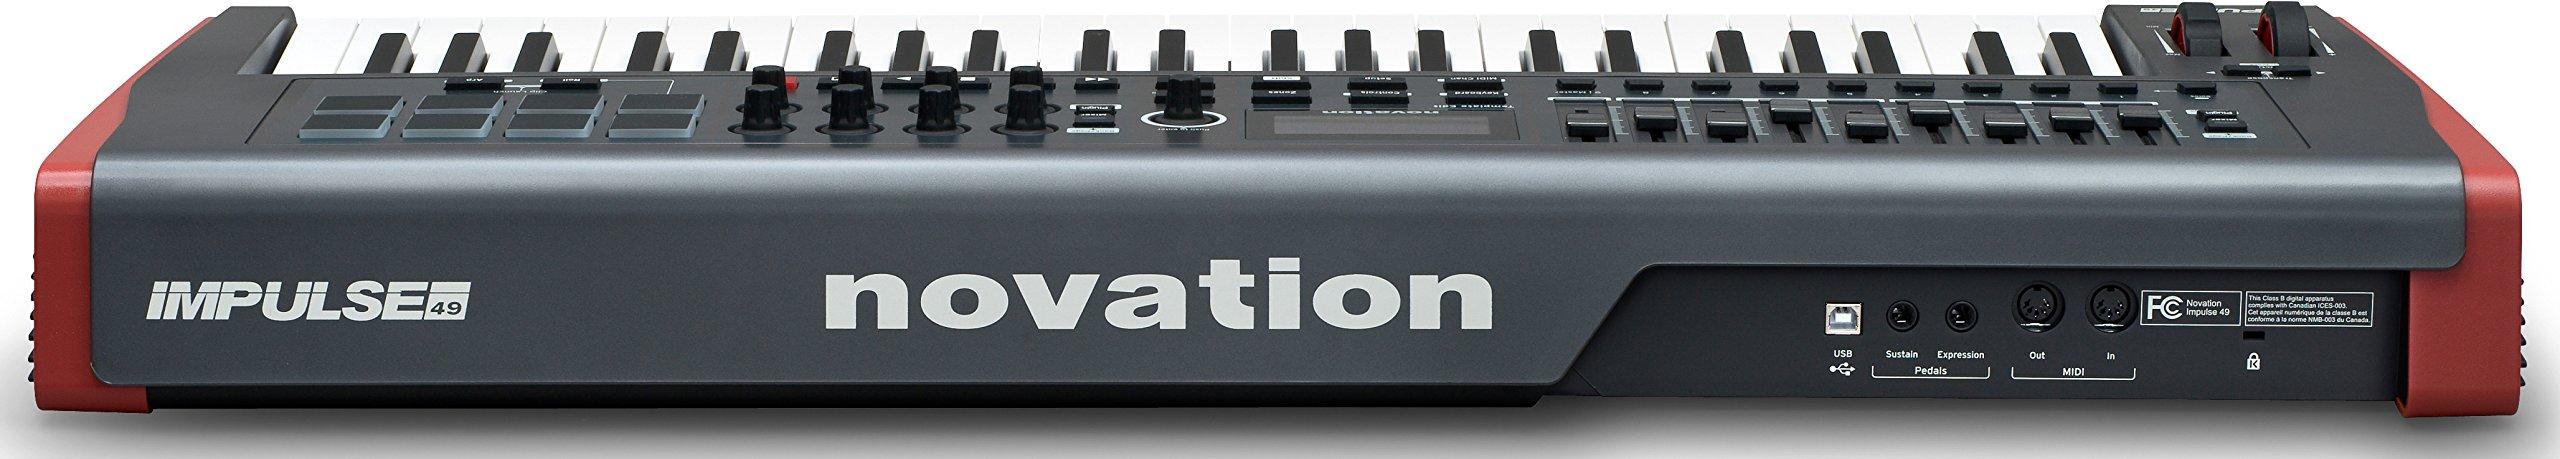 Novation Impulse 49 Keyboard Bundle with MIDI Cables and Austin Bazaar Polishing Cloth by Novation (Image #4)